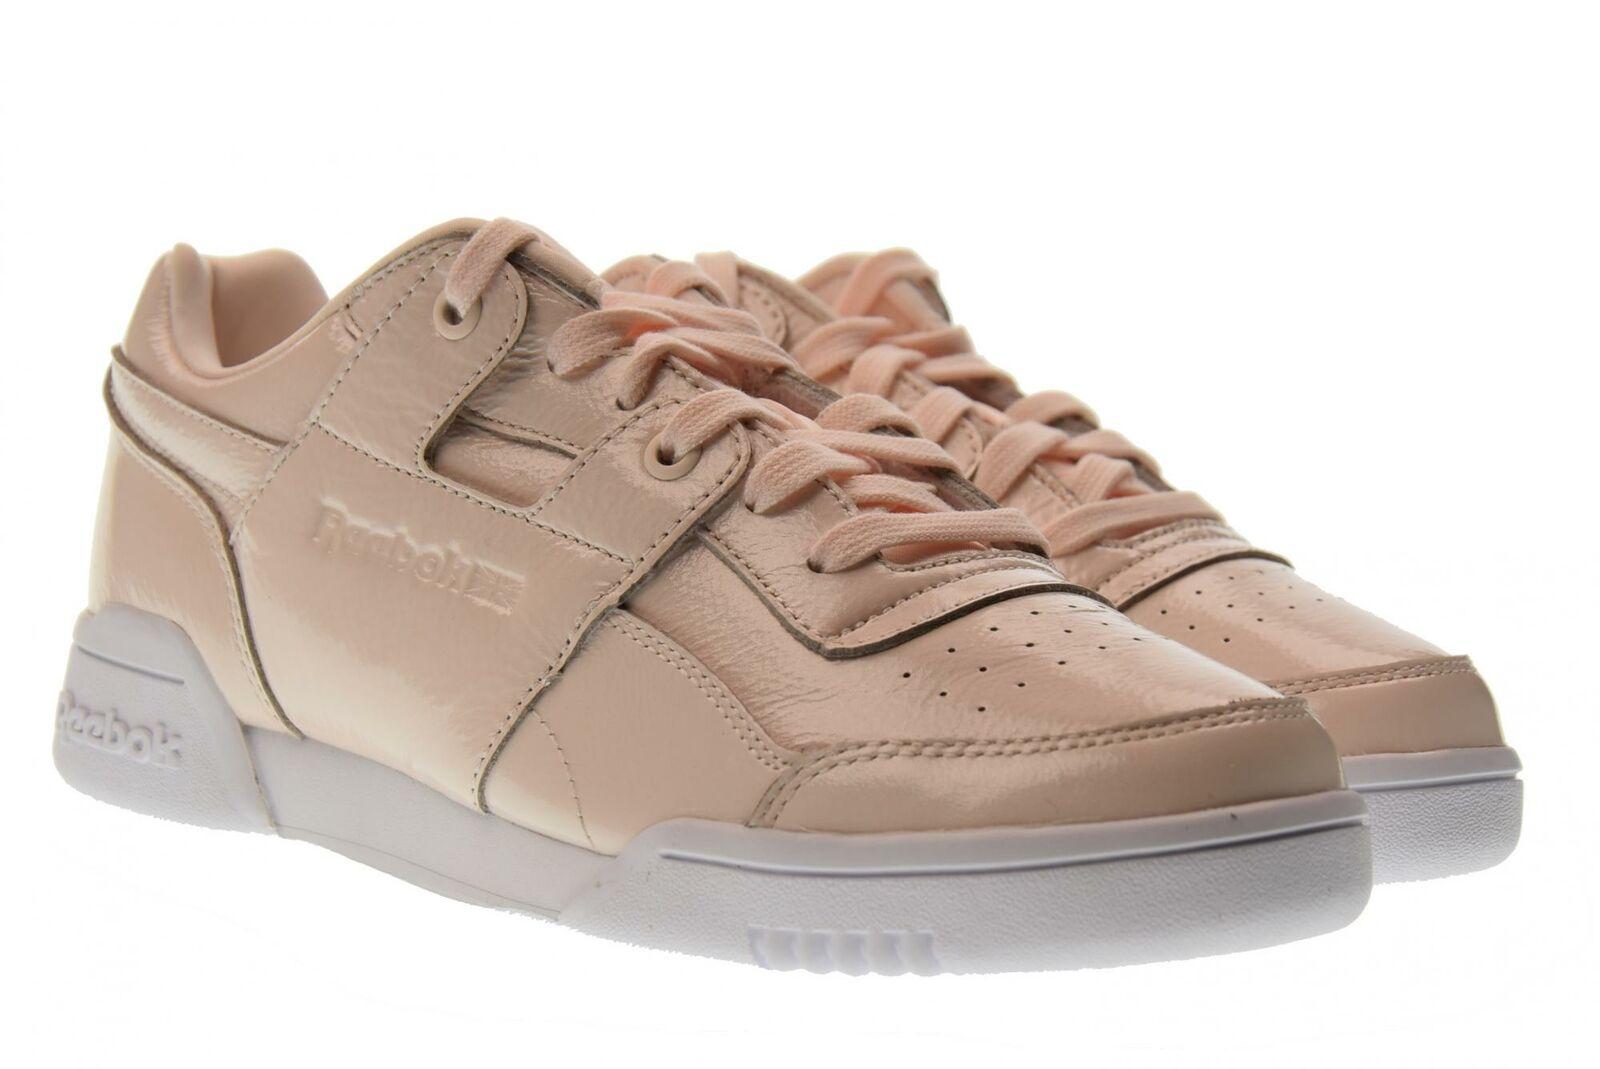 Reebok P18u shoes woman flat sneakers CM8951 W   O LO PLUS IRIDESCENT